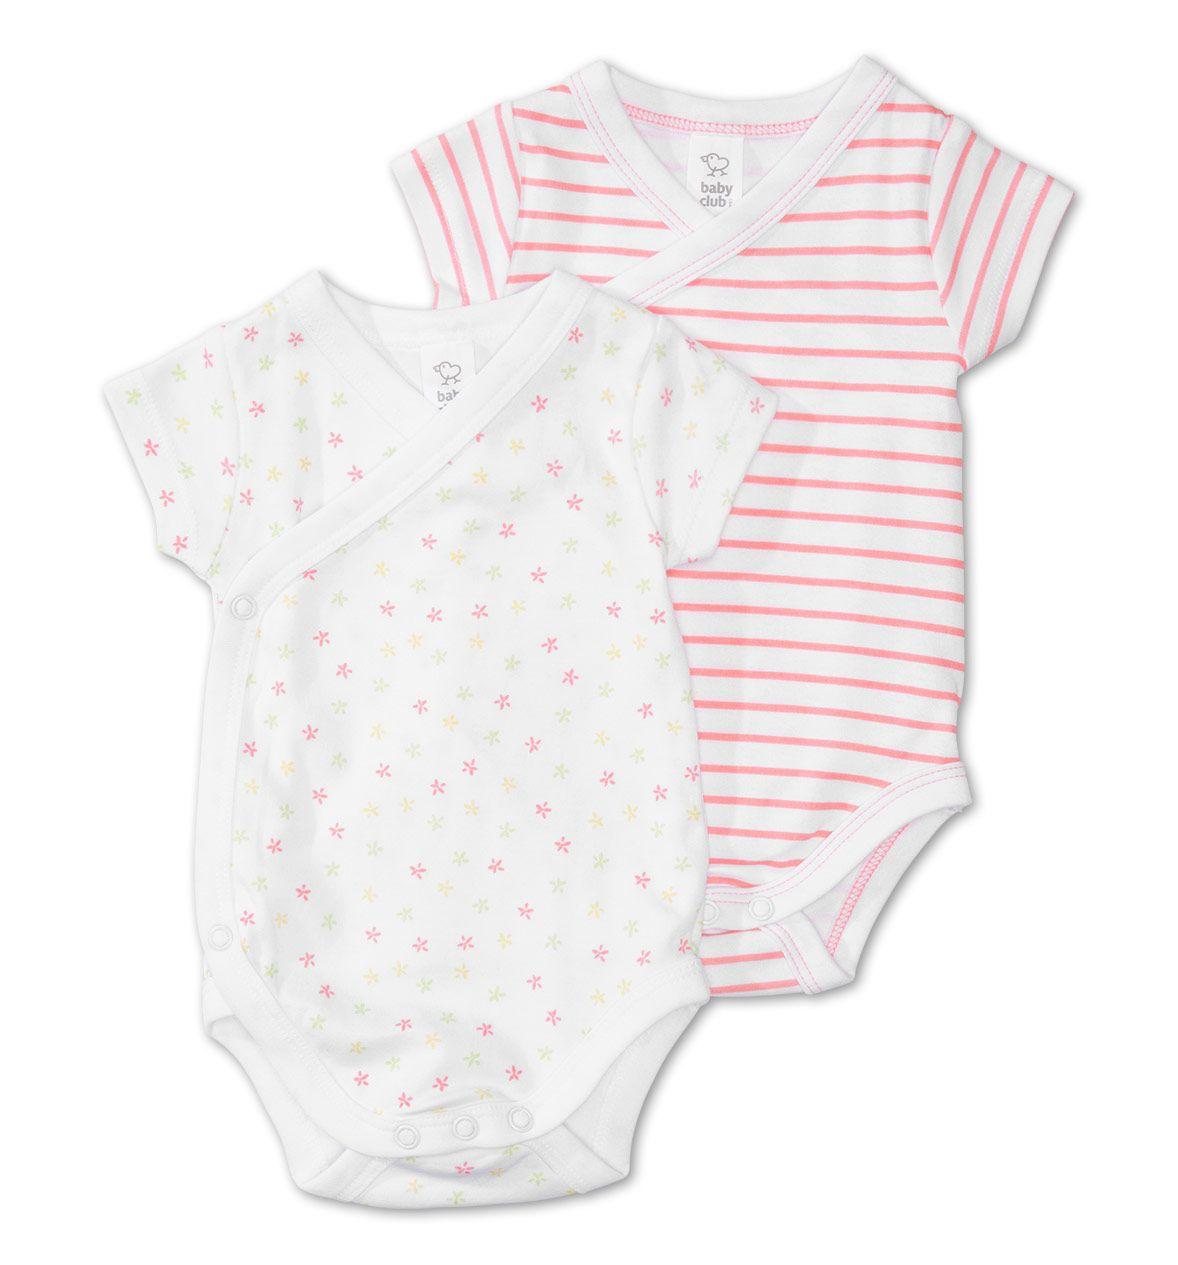 vente à bas prix enfant prix officiel Sklep internetowy C&A   Body niemowlęce, kolor: biały ...